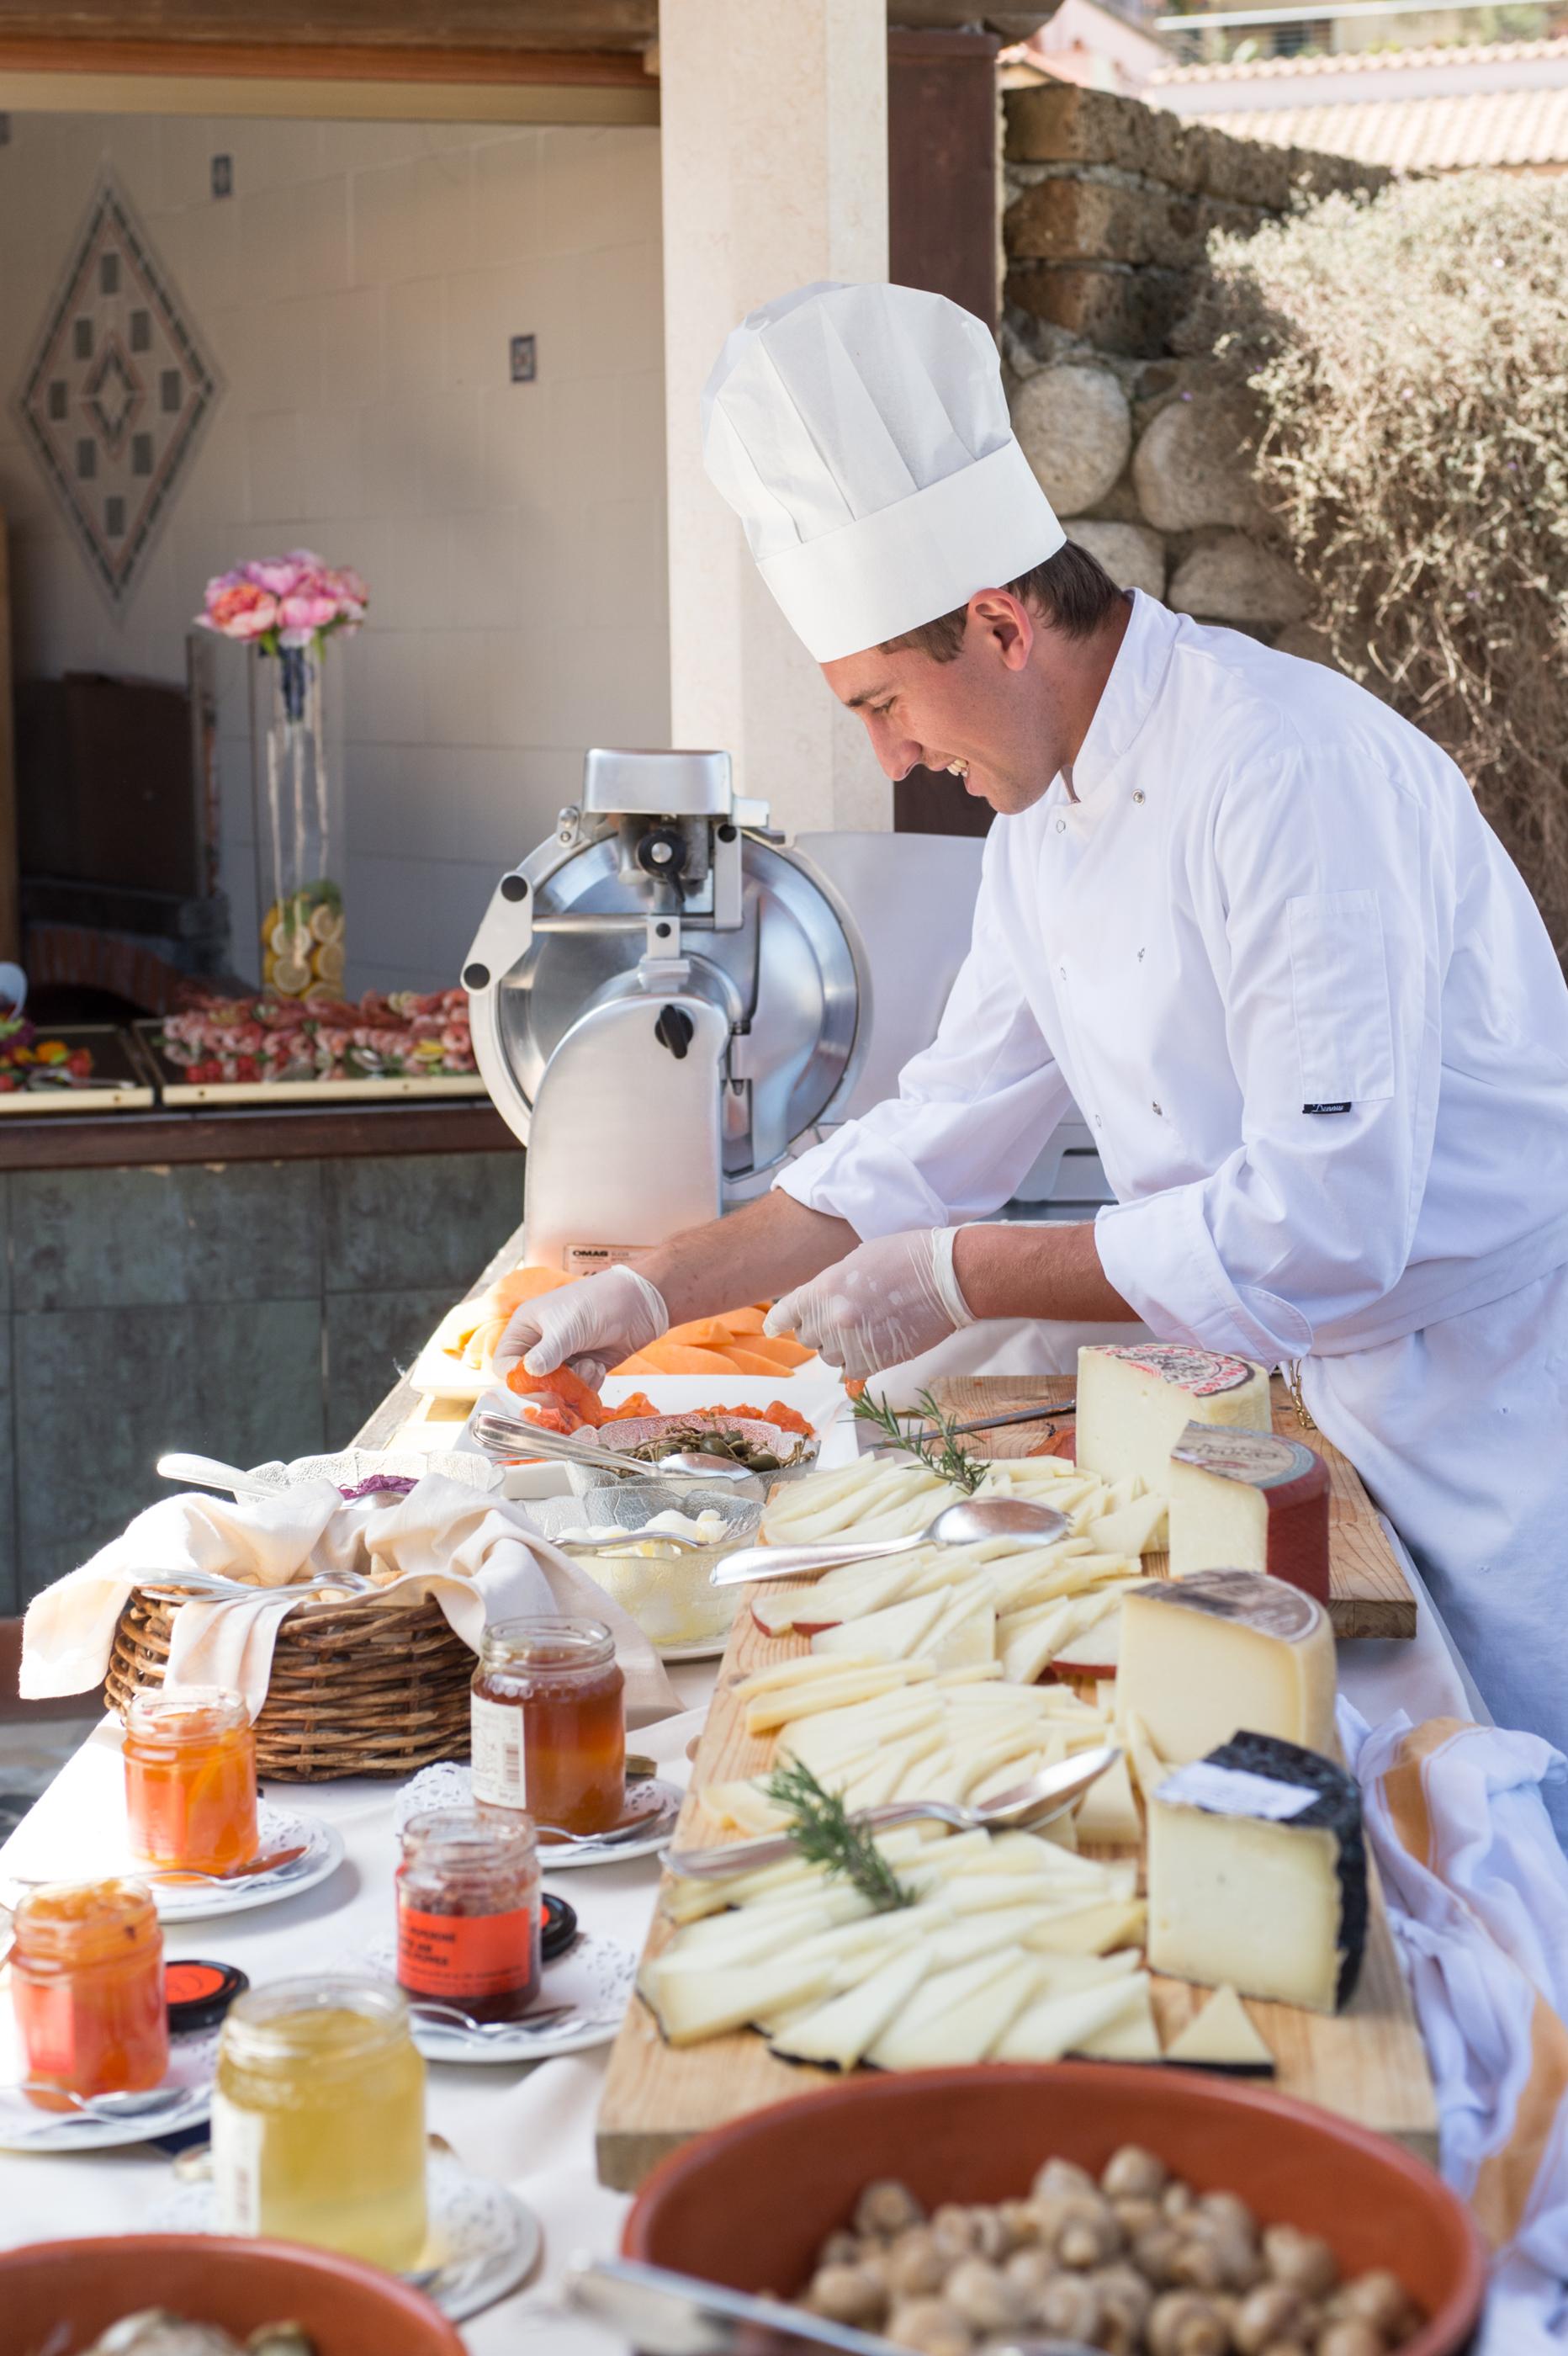 The Hermitage buffet will offer unbeaten variety